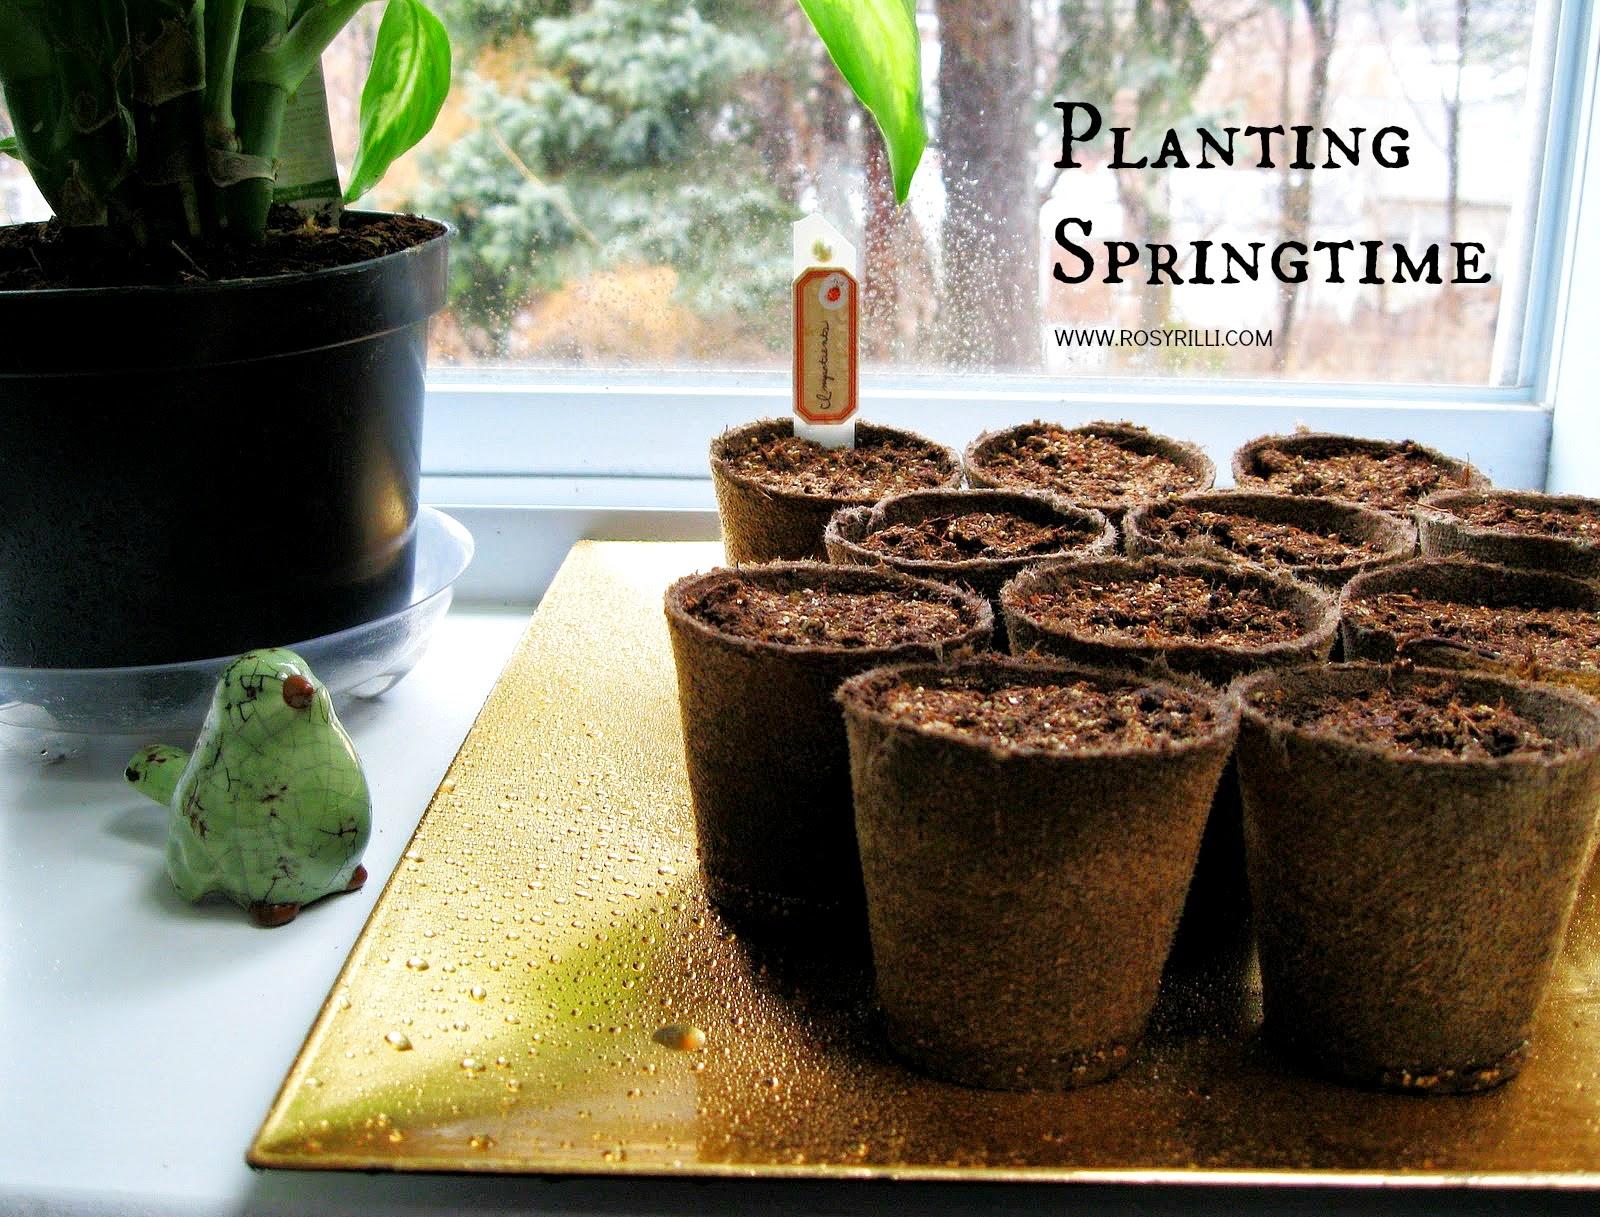 ROSYRILLI.COM March seedlings